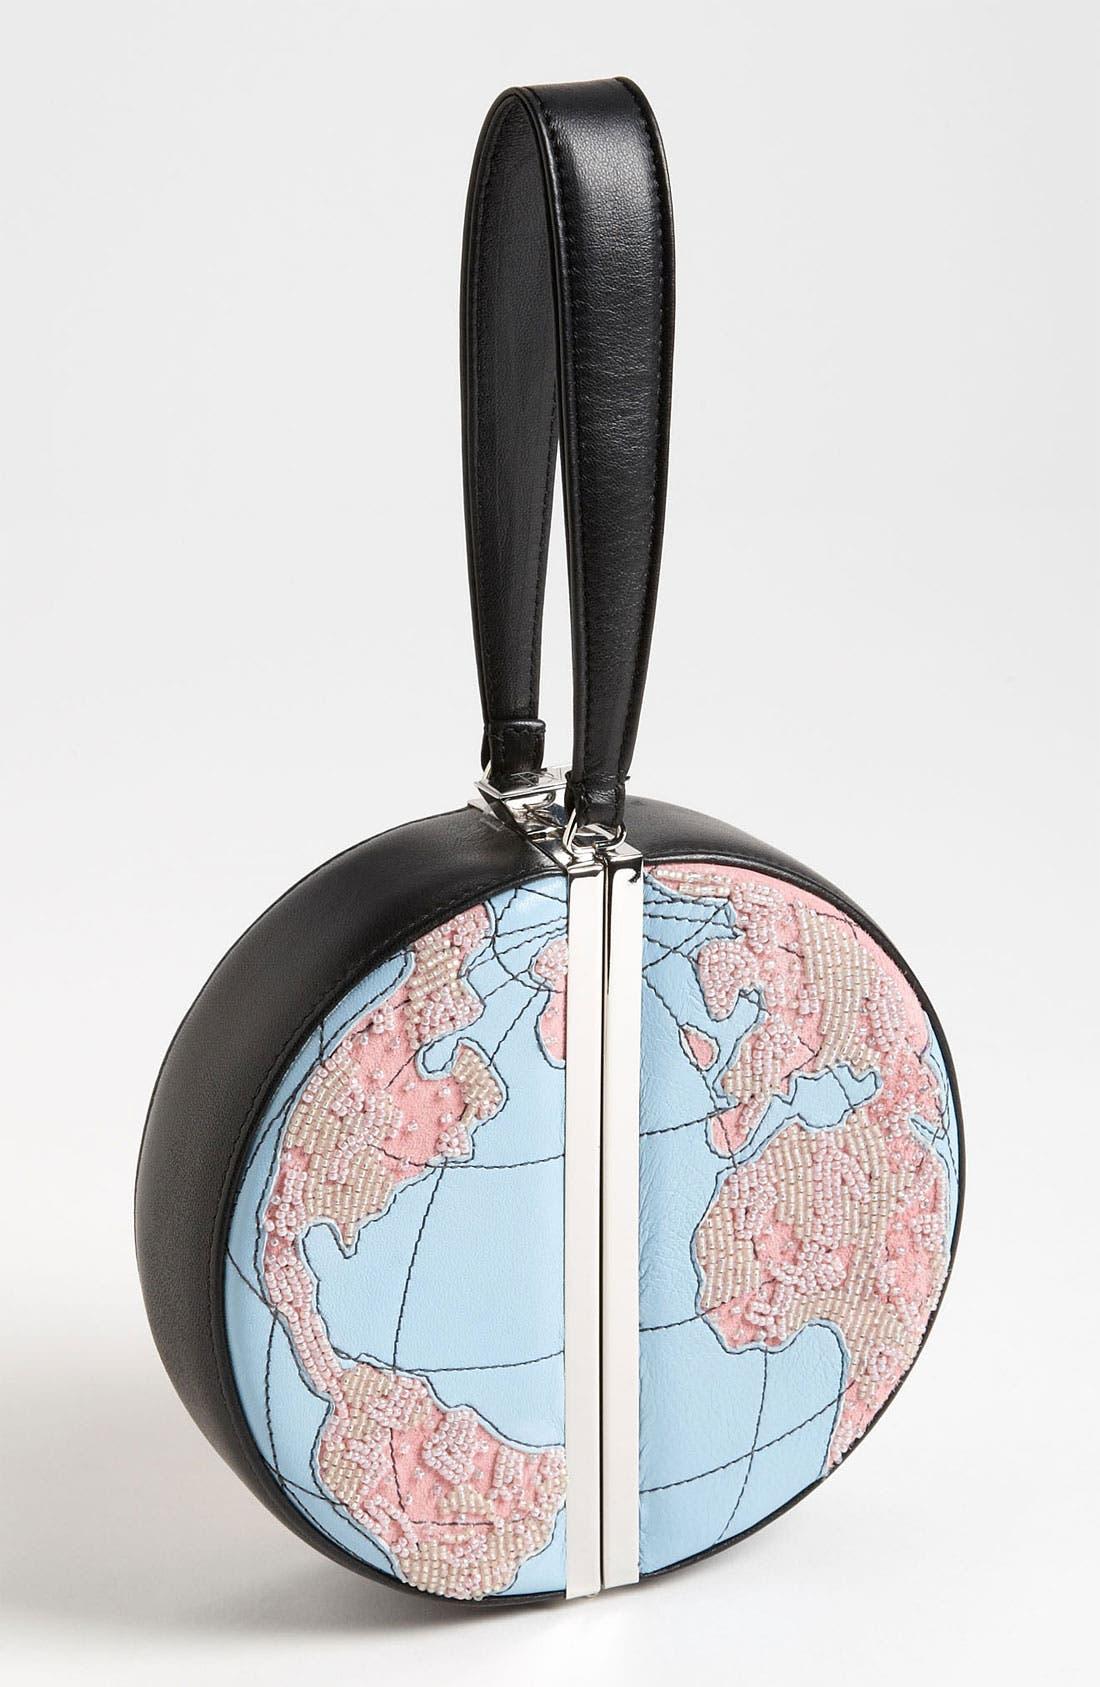 Alternate Image 1 Selected - Diane von Furstenberg 'Globe' Wristlet (Limited Edition)